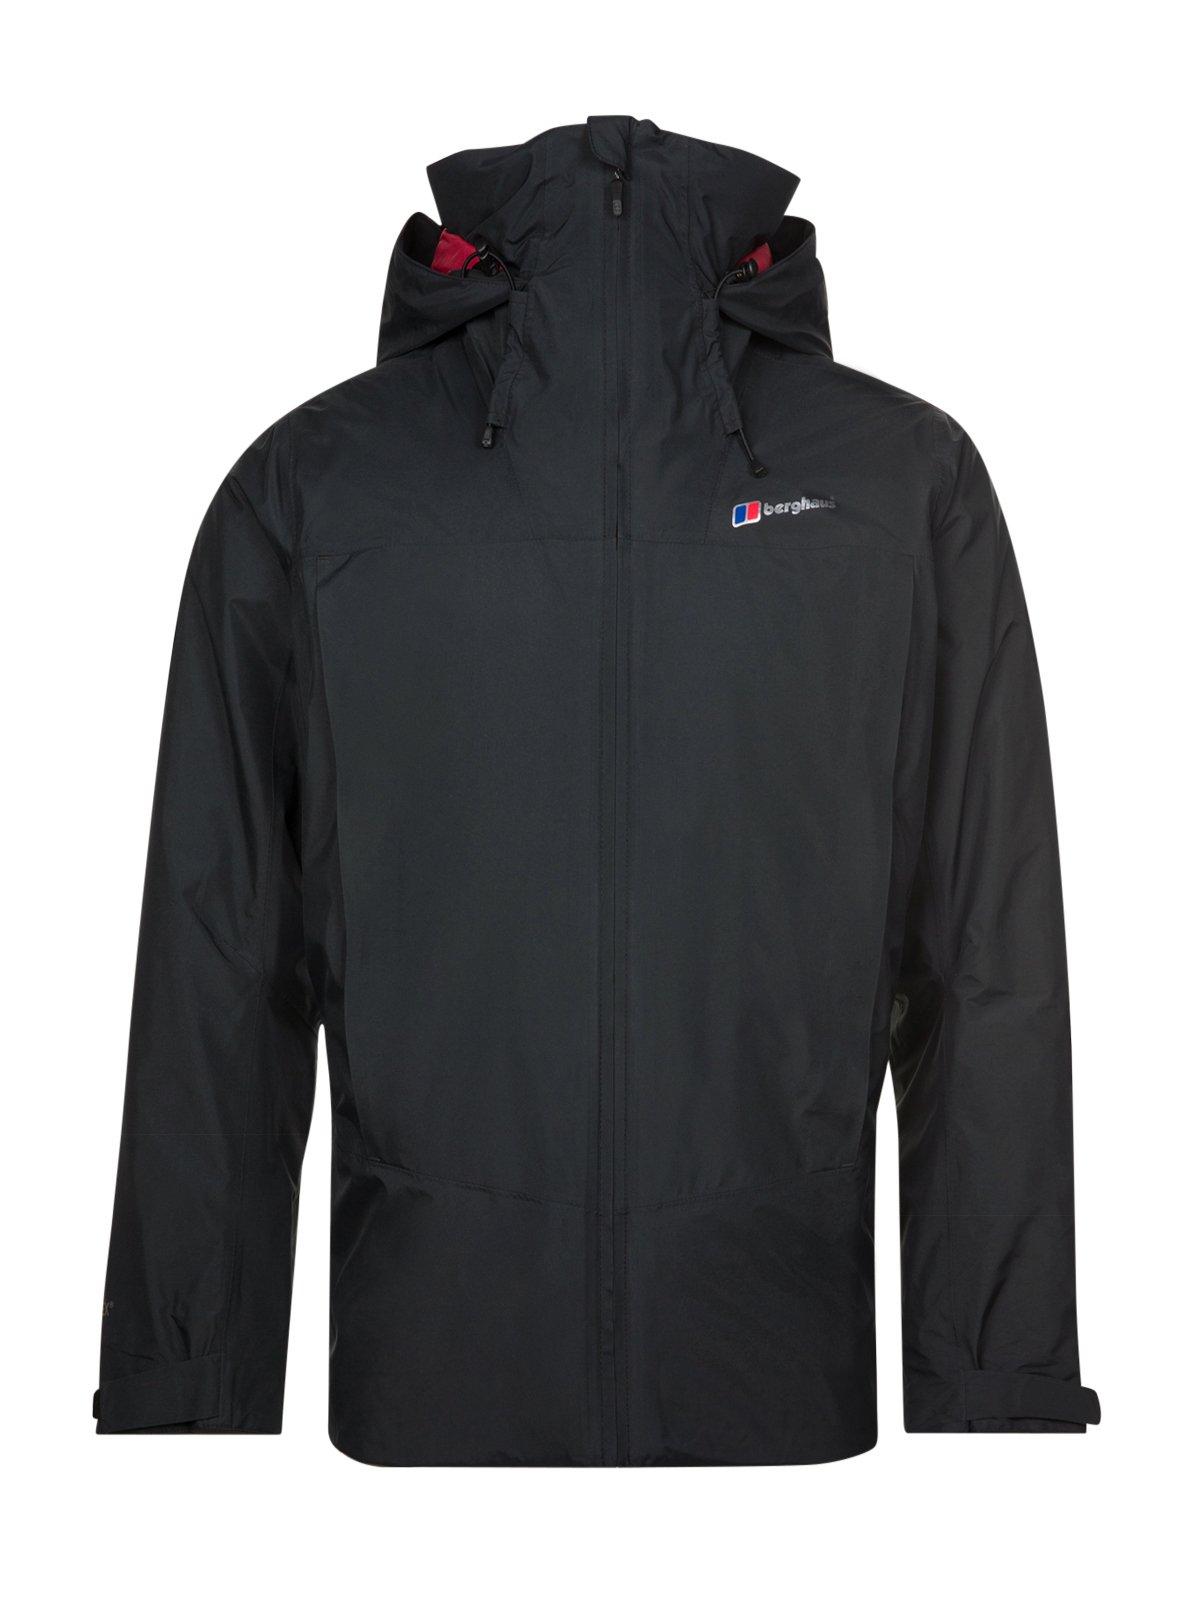 61FLrYUMolL - Berghaus Men's Helionik Loft Gore-Tex Waterproof Jacket